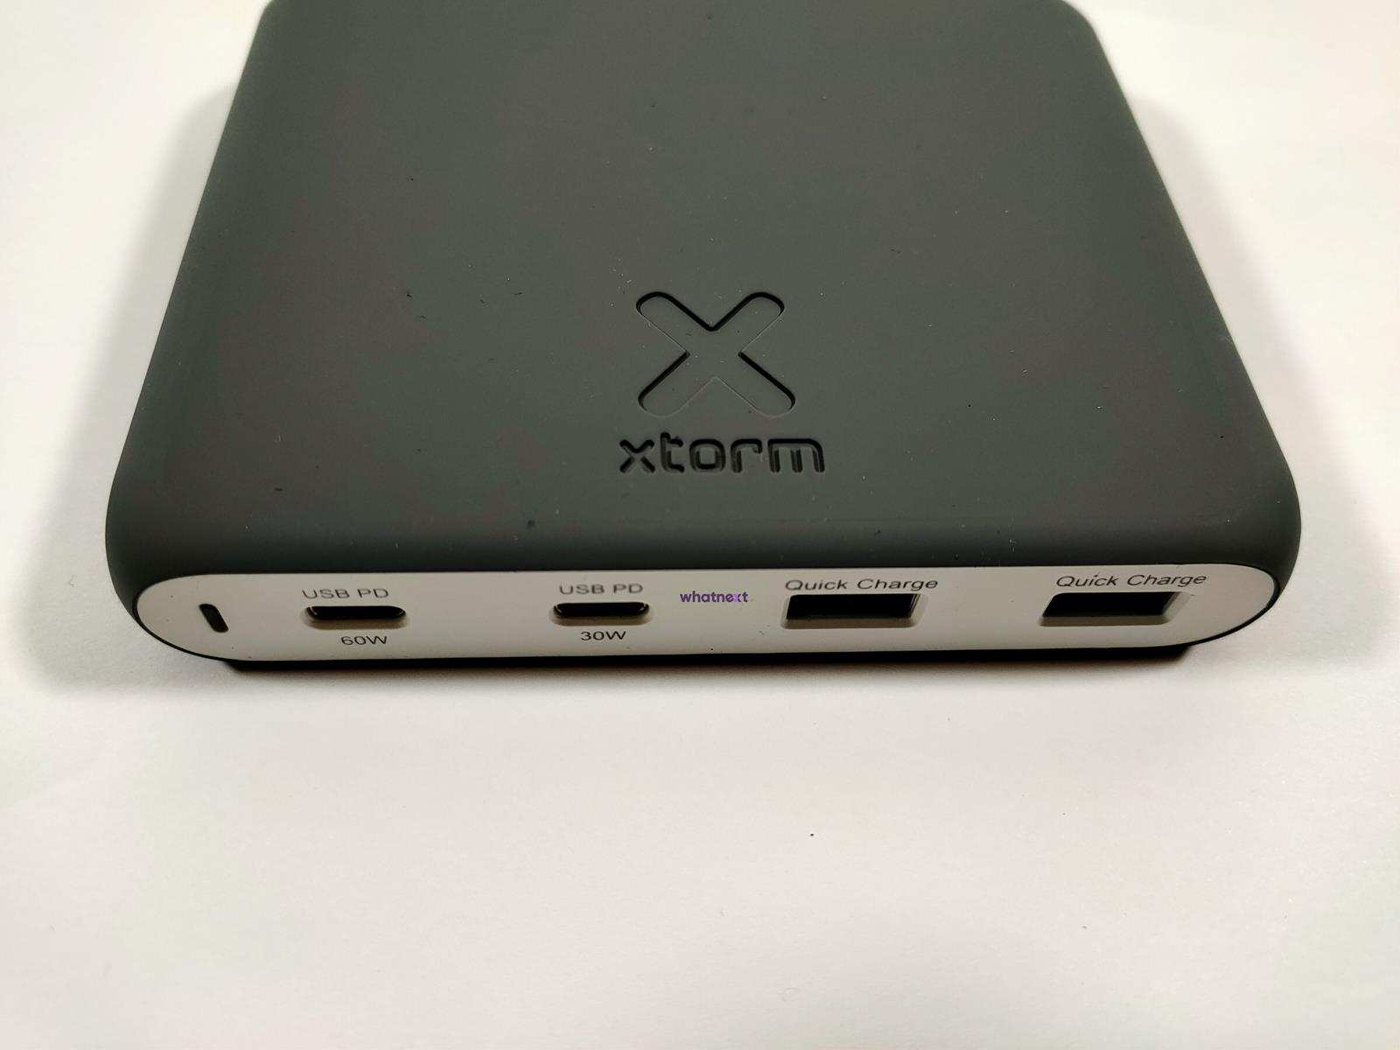 test Xtorm USB Power Hub Edge XPD20, recenzja Xtorm USB Power Hub Edge XPD20, review Xtorm USB Power Hub Edge XPD20, opinia Xtorm USB Power Hub Edge XPD20